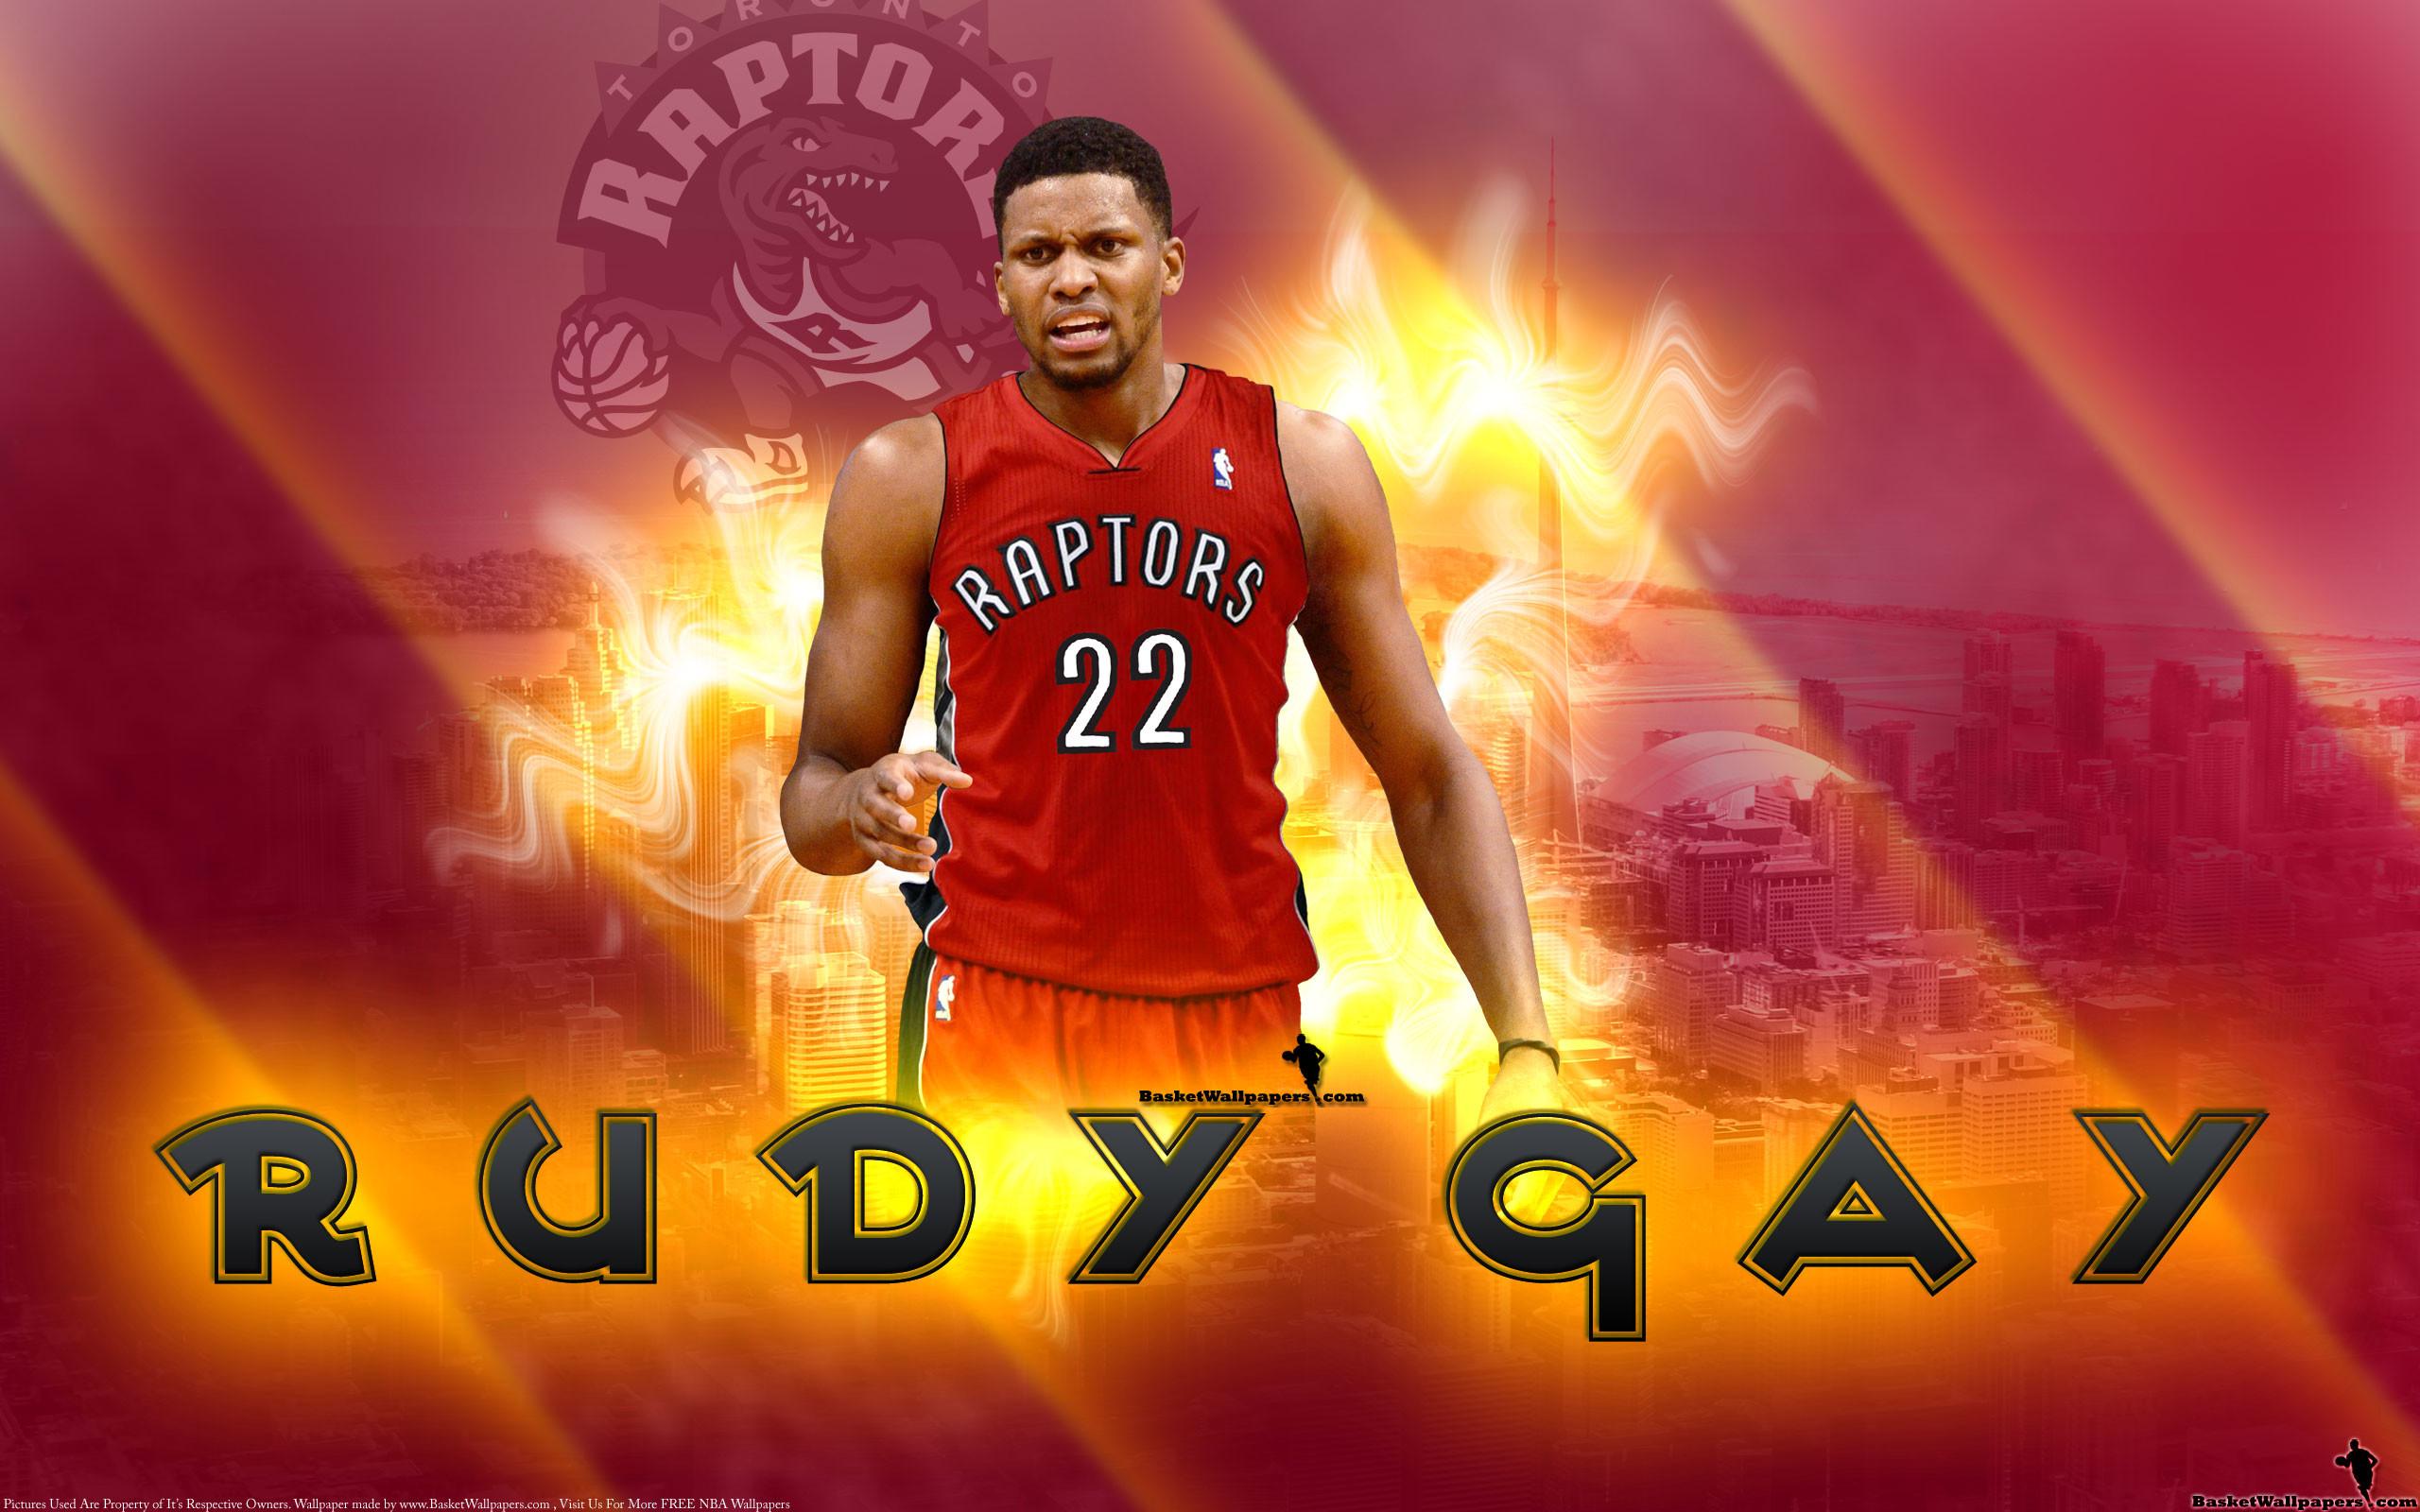 Rudy Gay Toronto Raptors 2013 Wallpaper